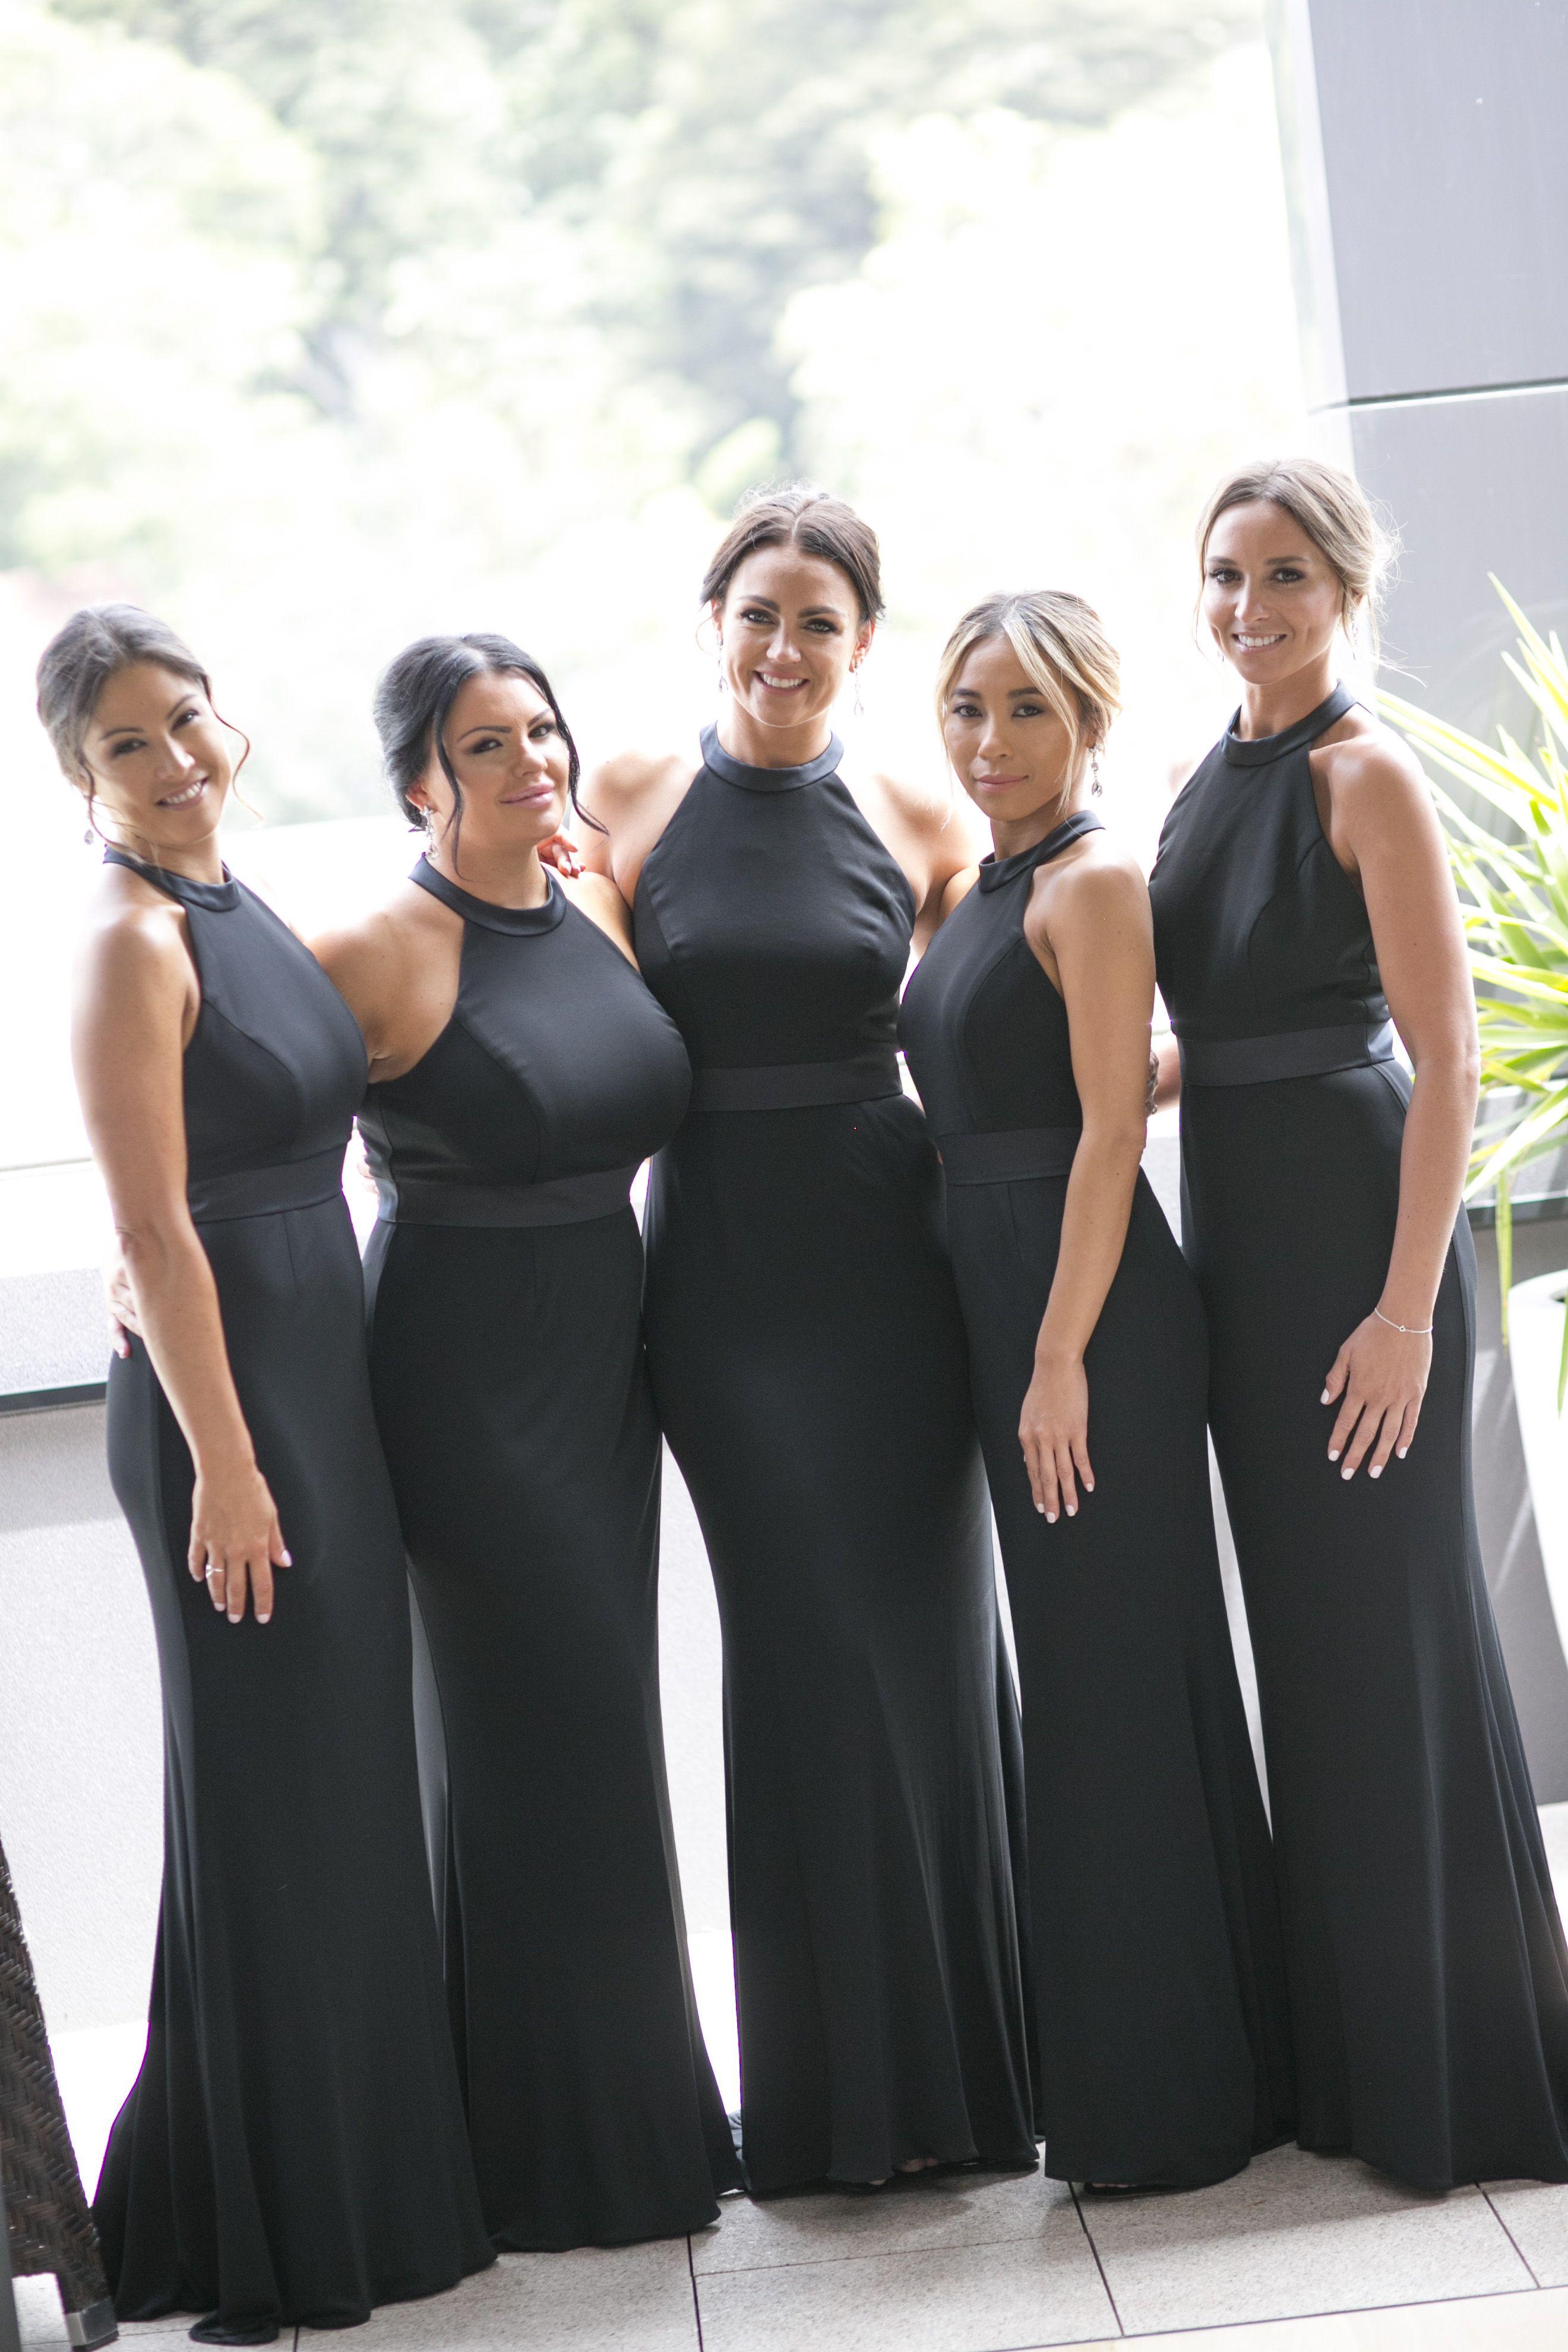 Who said Bridesmaids canu0027t wear black Who